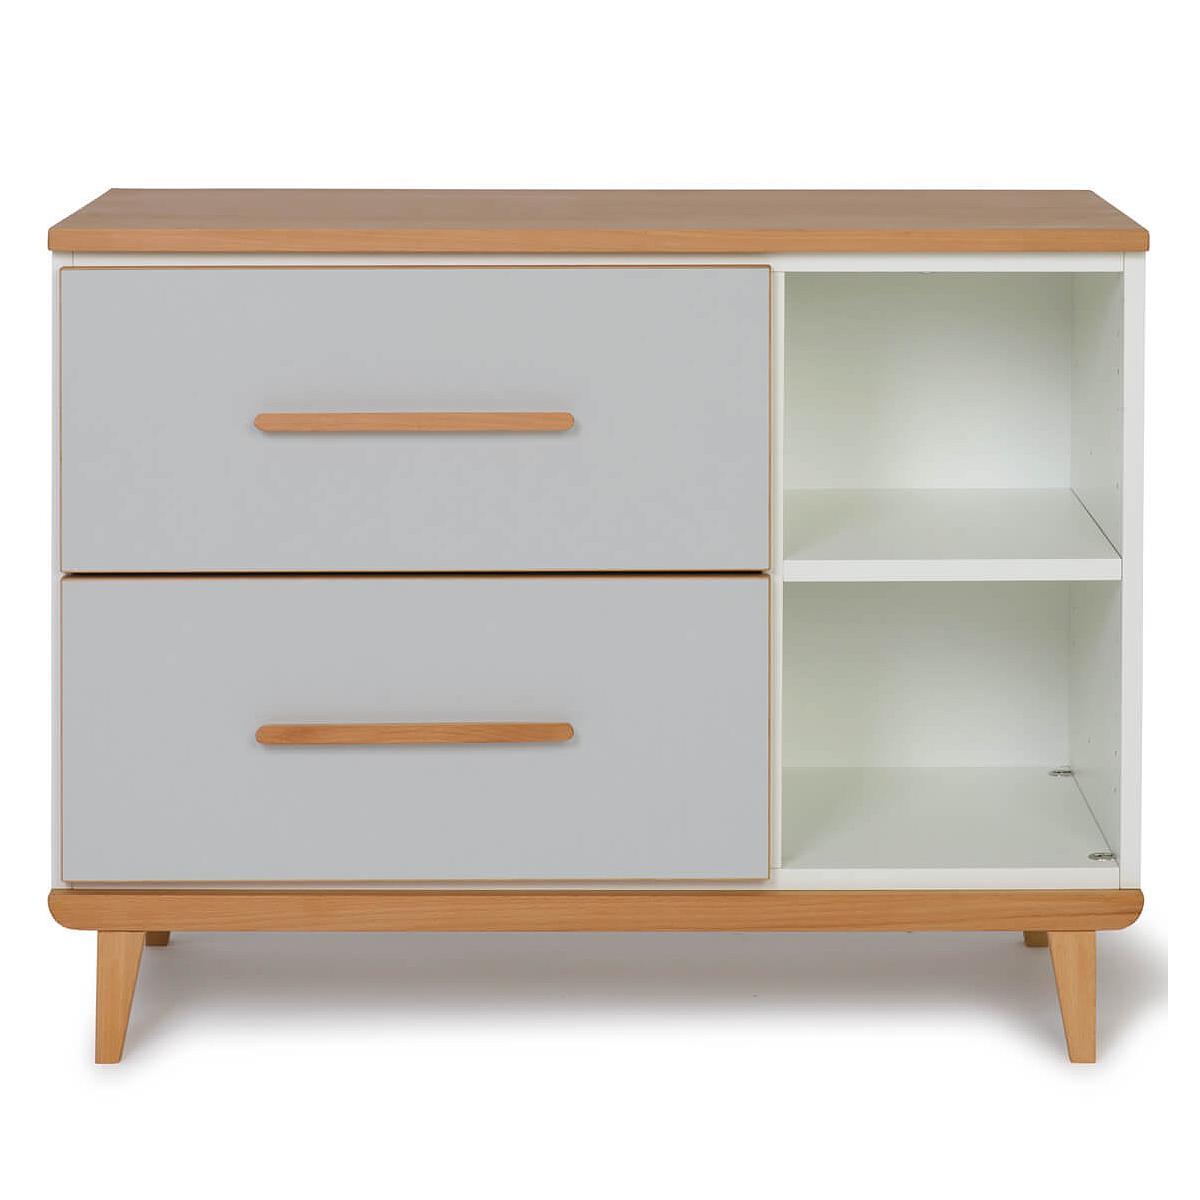 Wookids - Petit meuble 2 tiroirs NADO grey